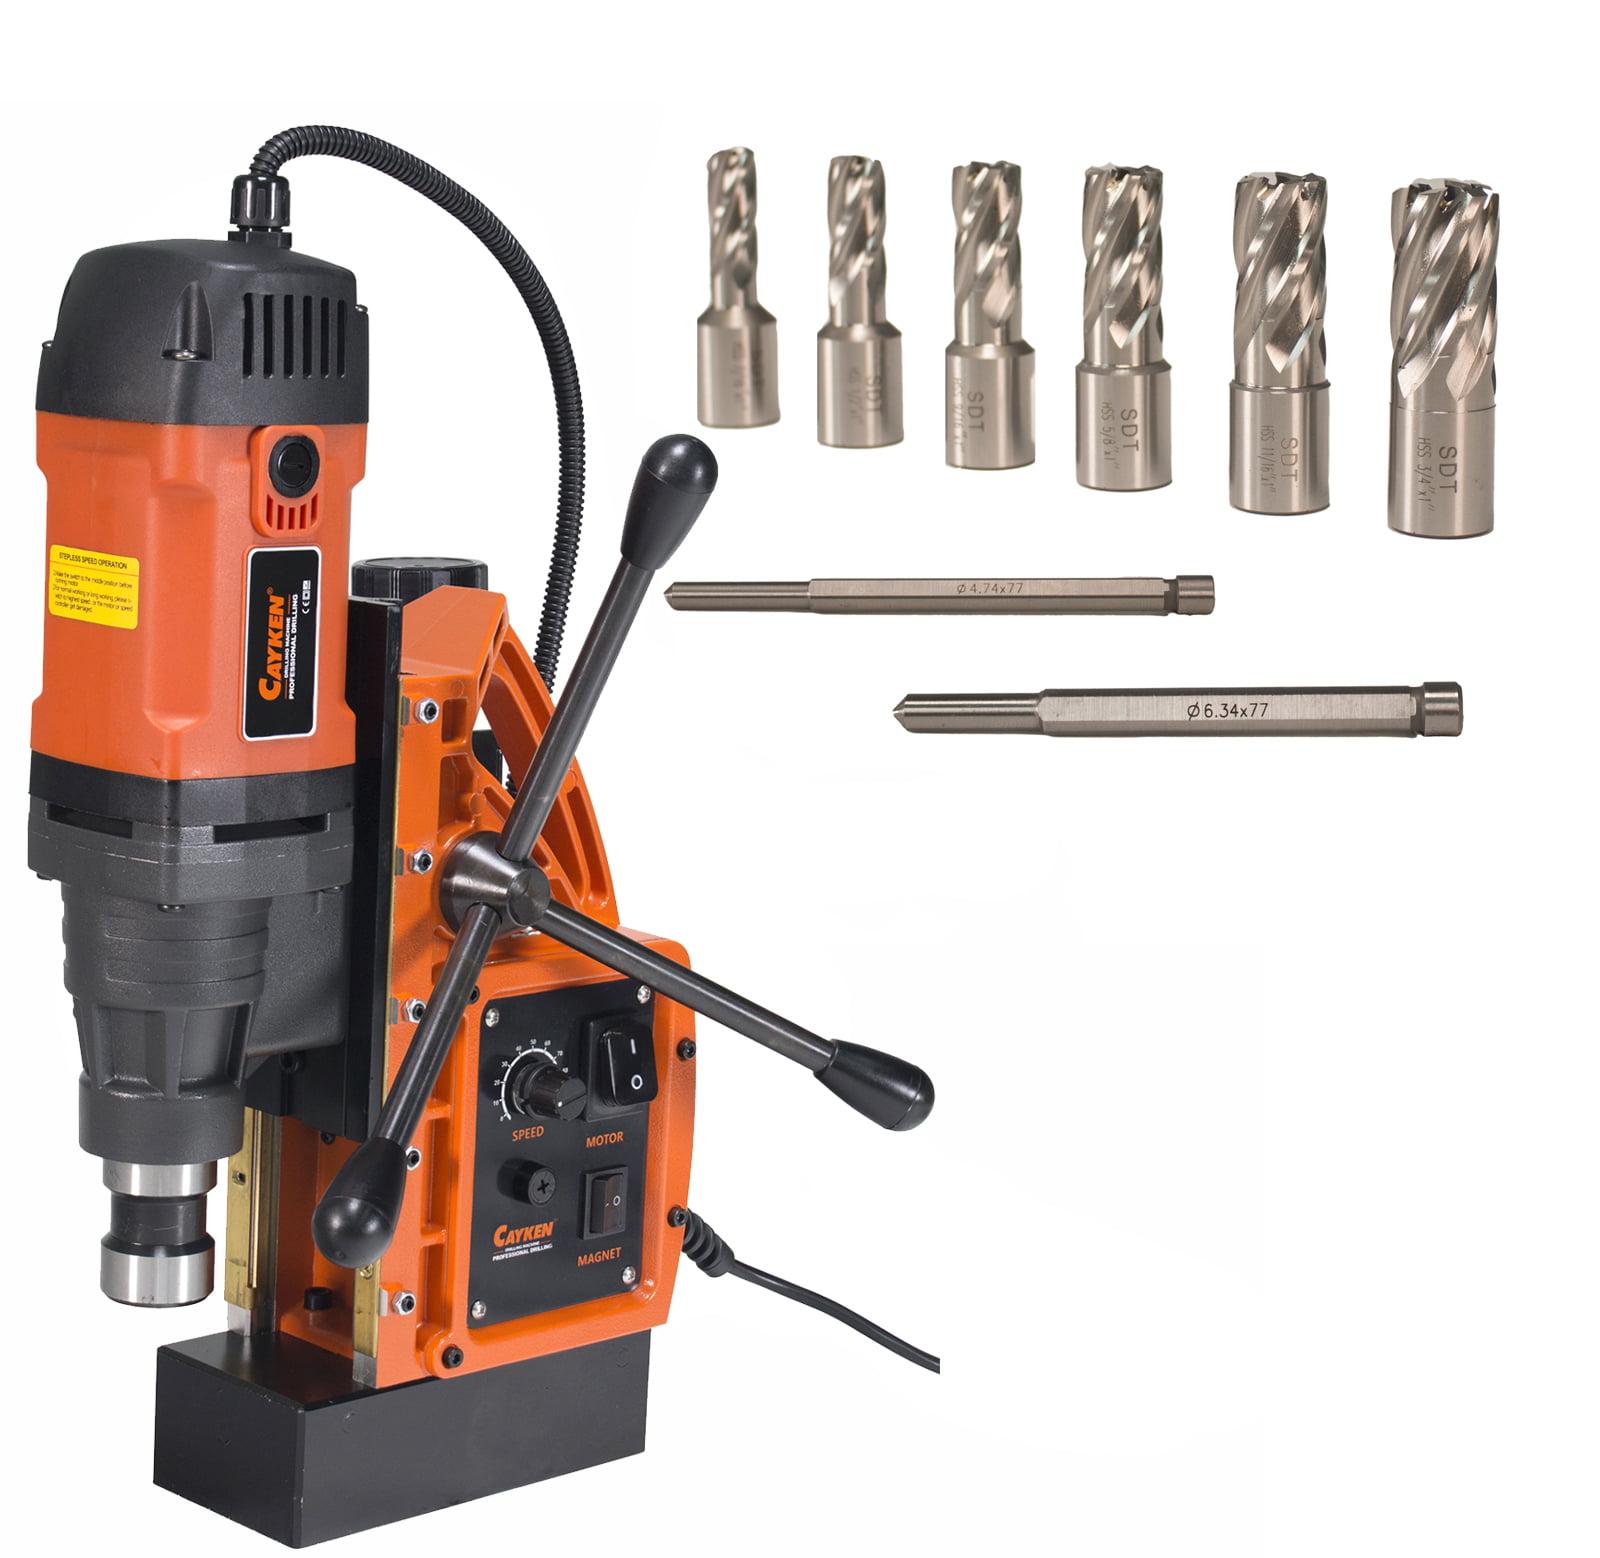 "Cayken SCY-42HD 1.65"" Magnetic Drill Press with Weldon Shank and 7 Piece Small Diameter 1"" Cut Depth... by Cayken"